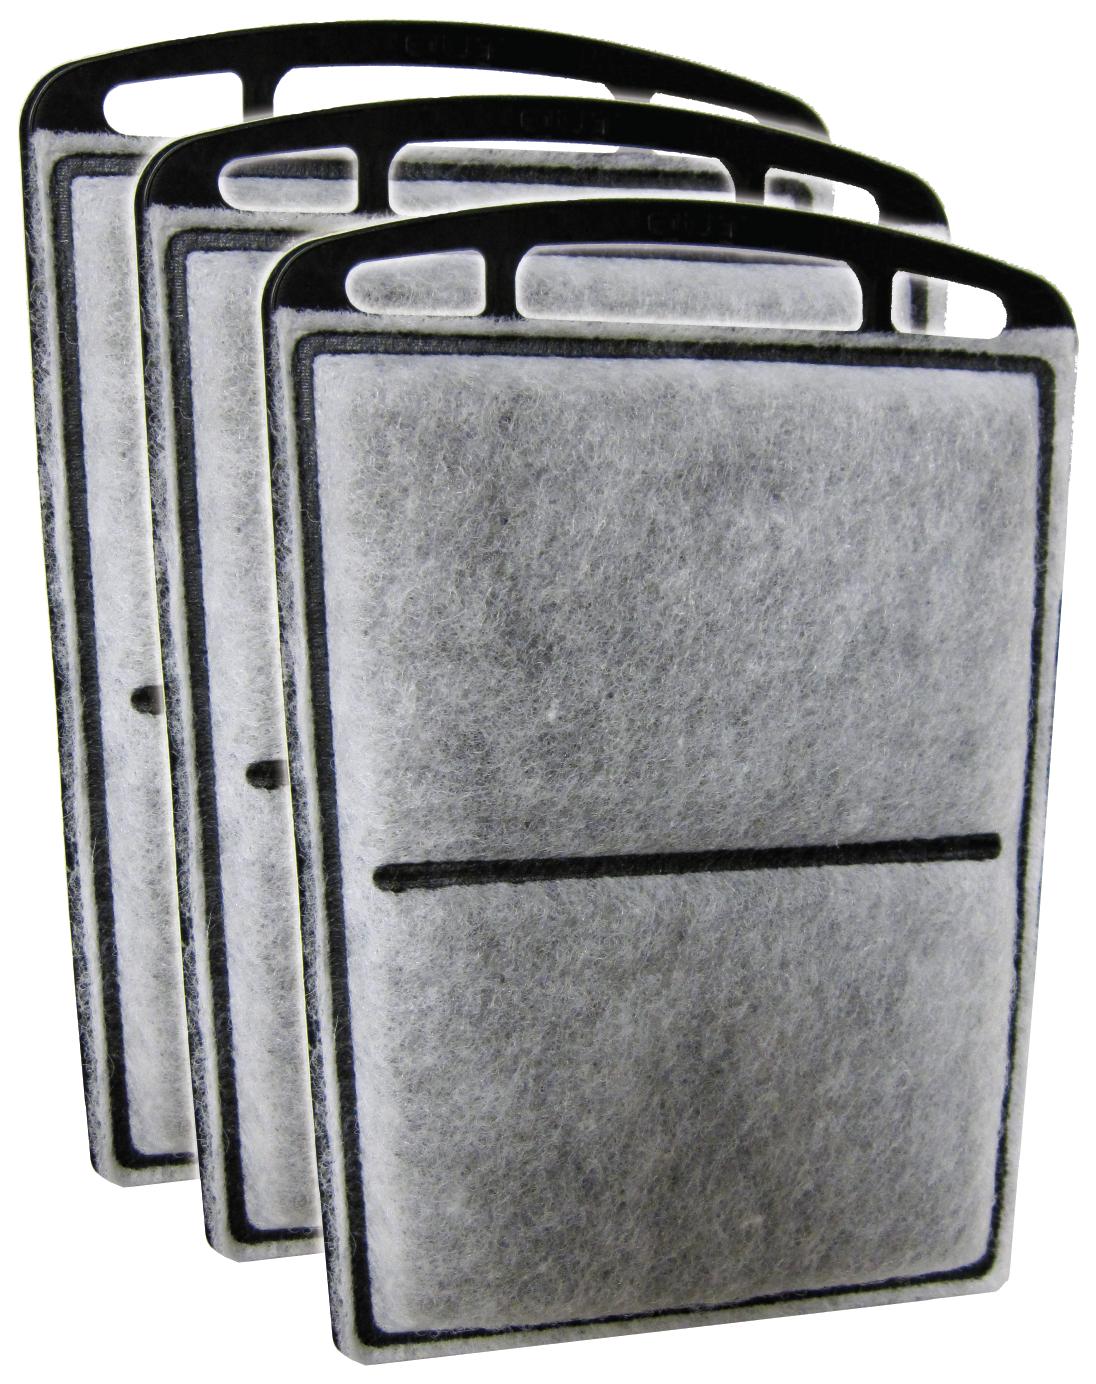 3 Pack Model 55 Cartridges   SKU#:  UPC#:  Individual Package Dimensions:  Master Carton Dimensions:  Master Carton Pack:  Master Carton Weight: